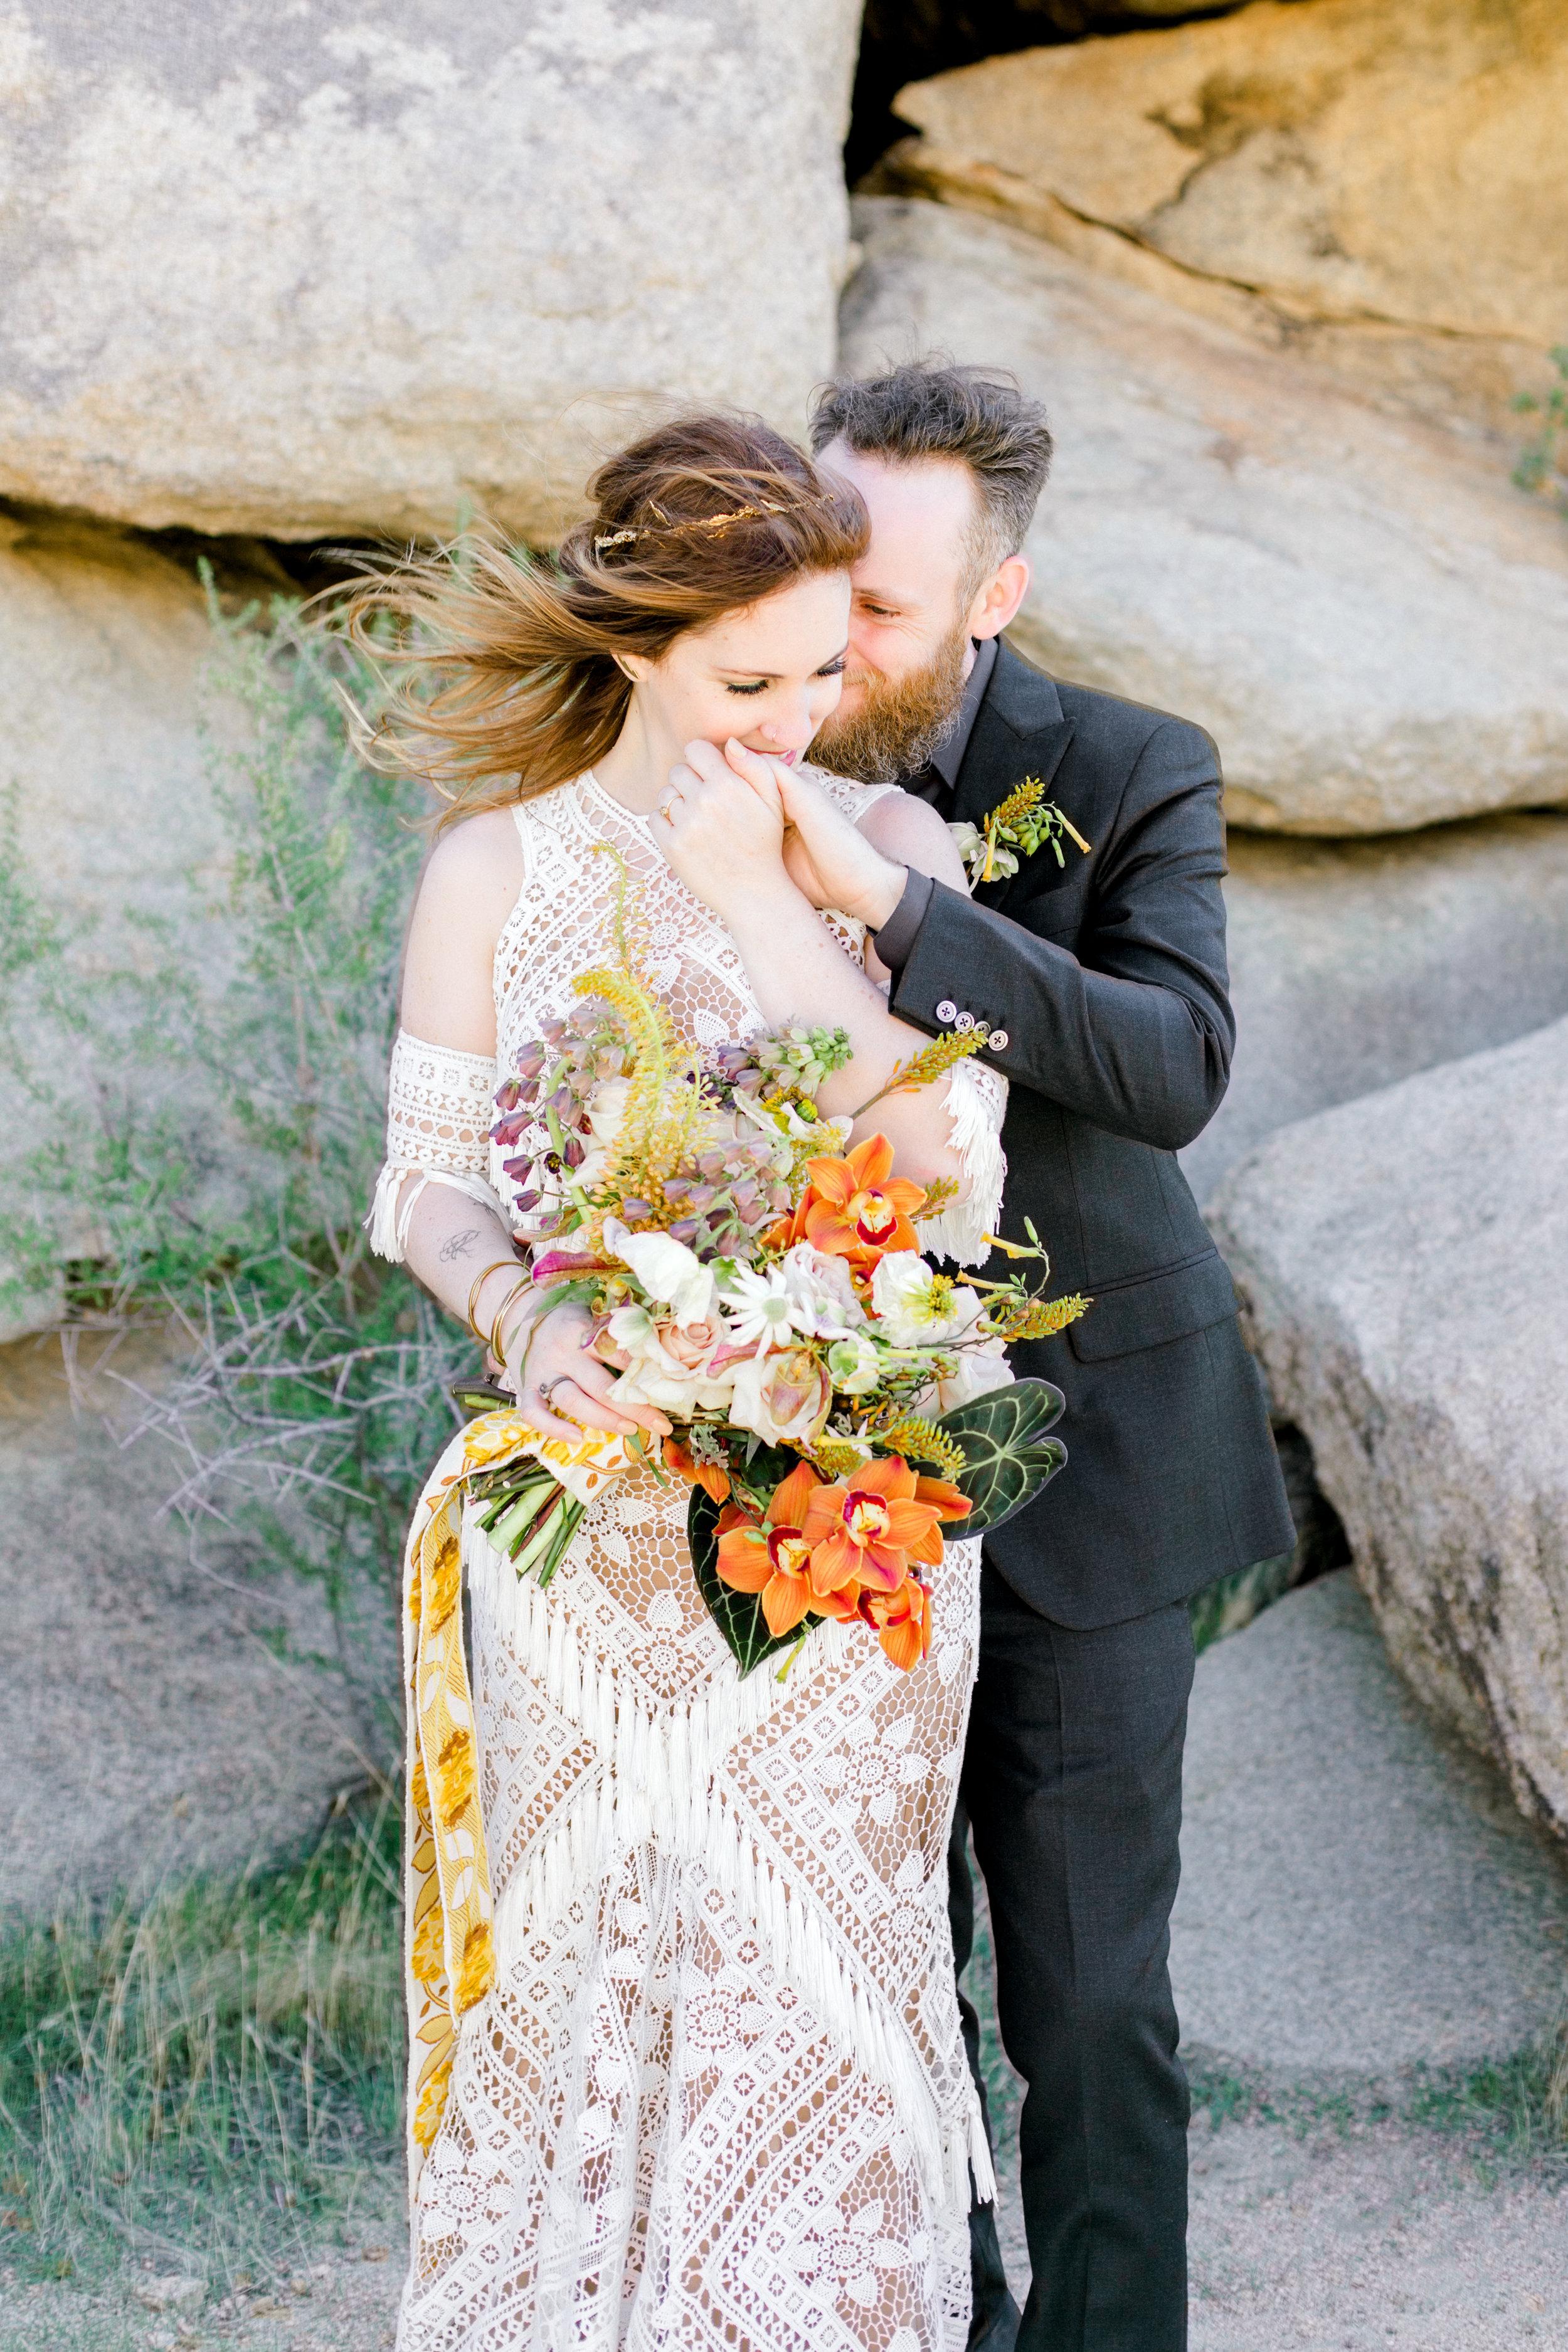 jessica sgubin photography atlanta portrait photographer engagement family couple wedding joshua tree wedding elopement-1-5.jpg